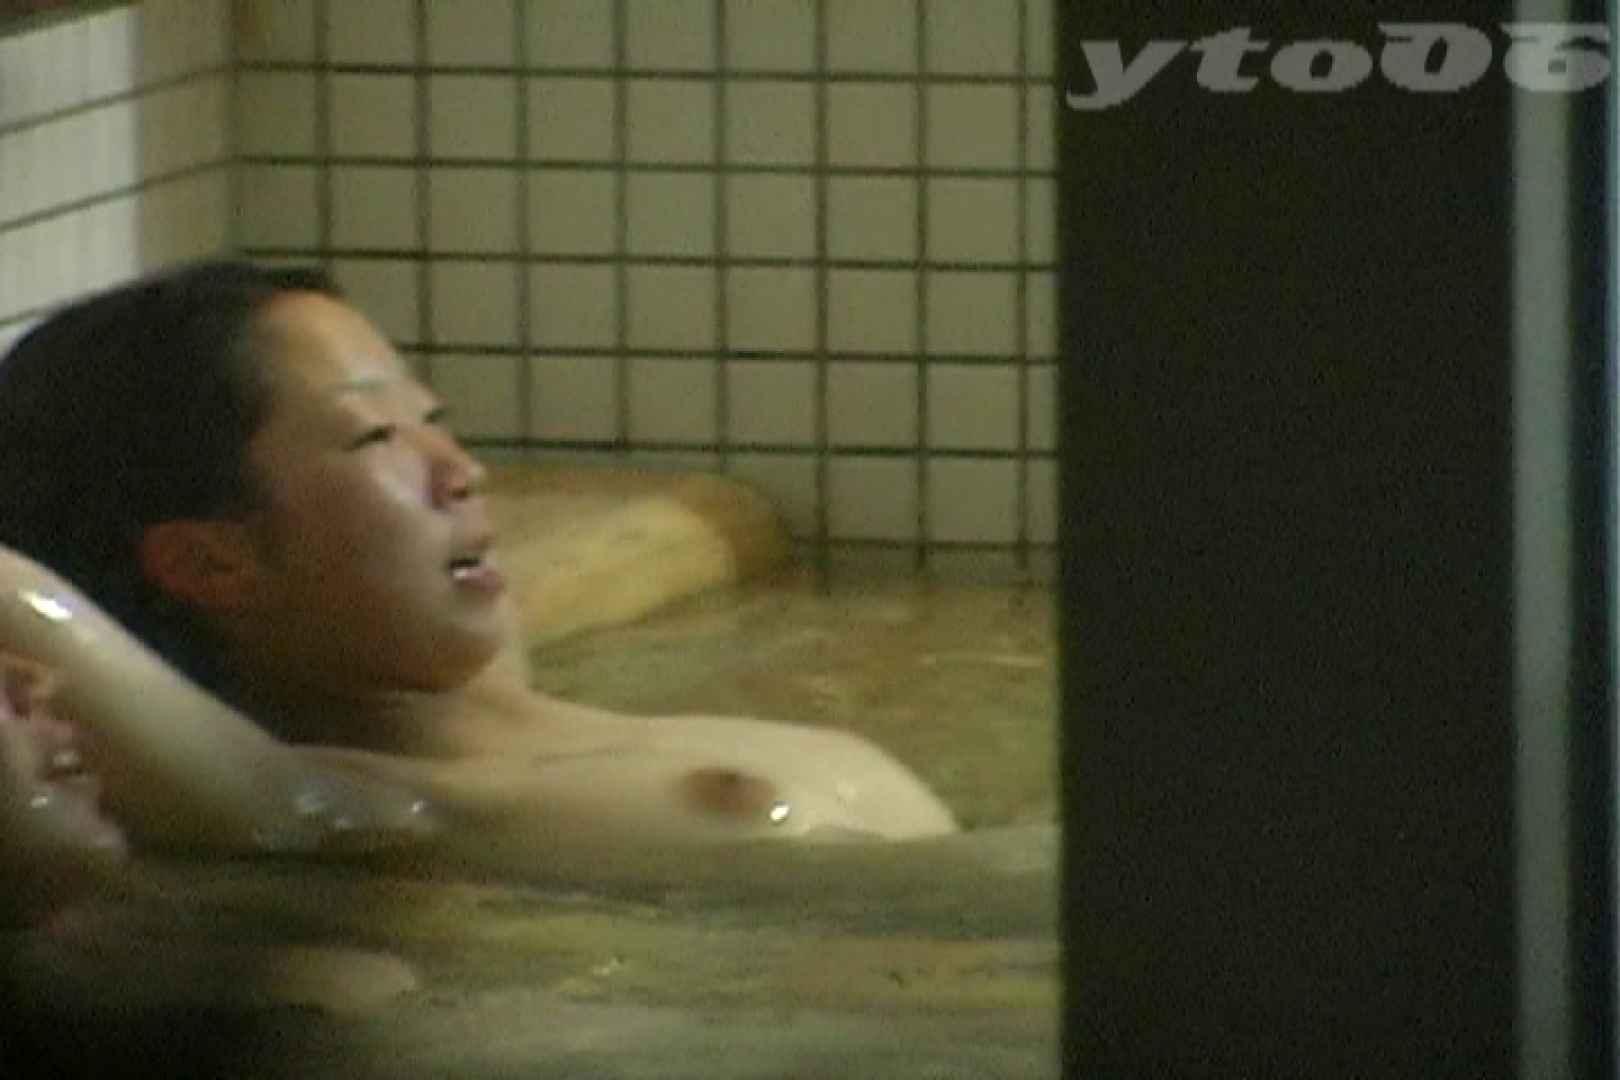 ▲復活限定▲合宿ホテル女風呂盗撮 Vol.32 女風呂 スケベ動画紹介 64連発 22